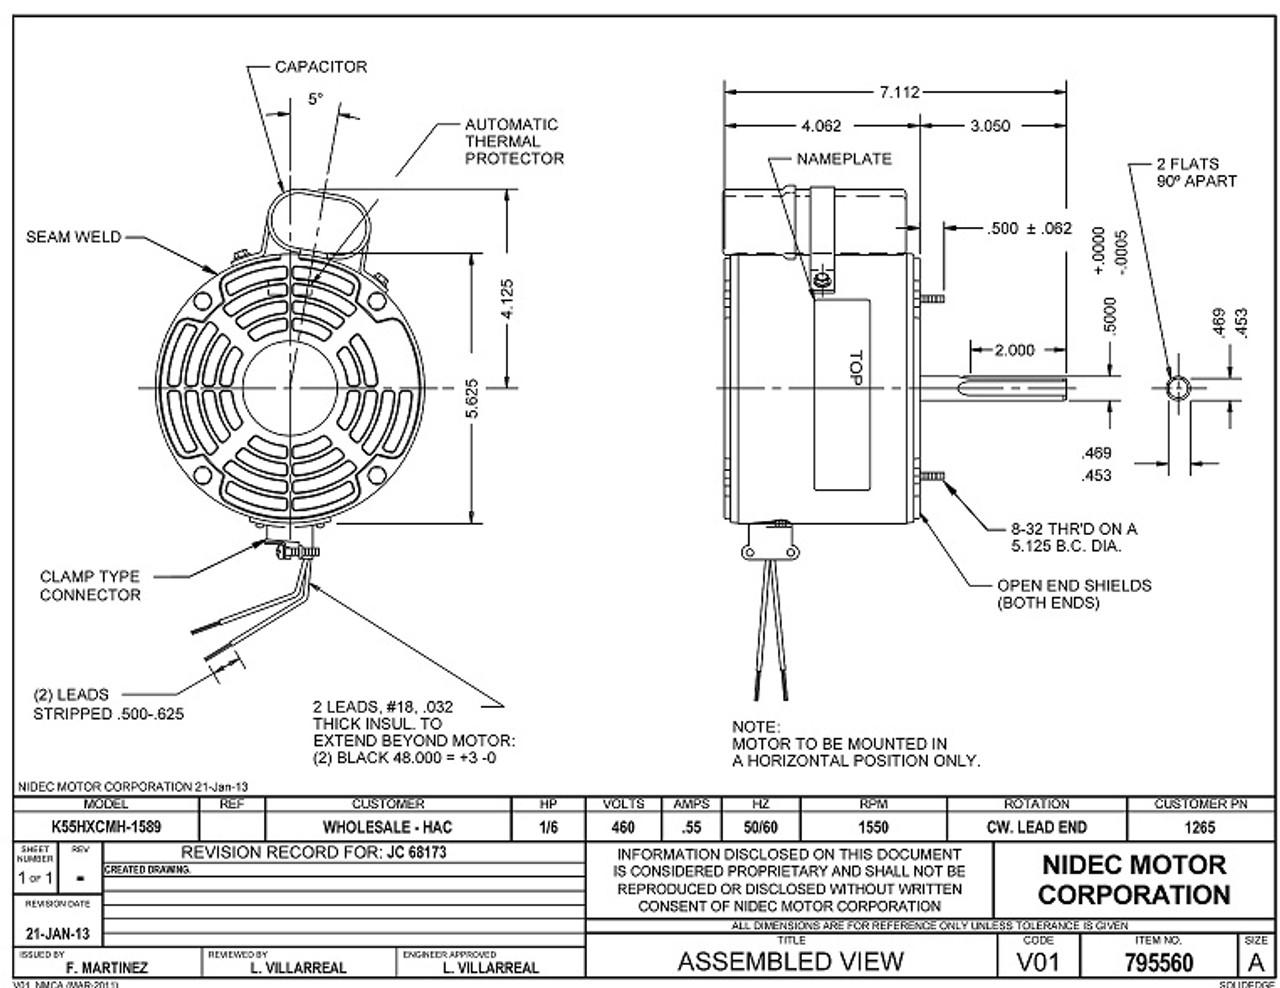 Emerson Wiring Diagram Electric Motor